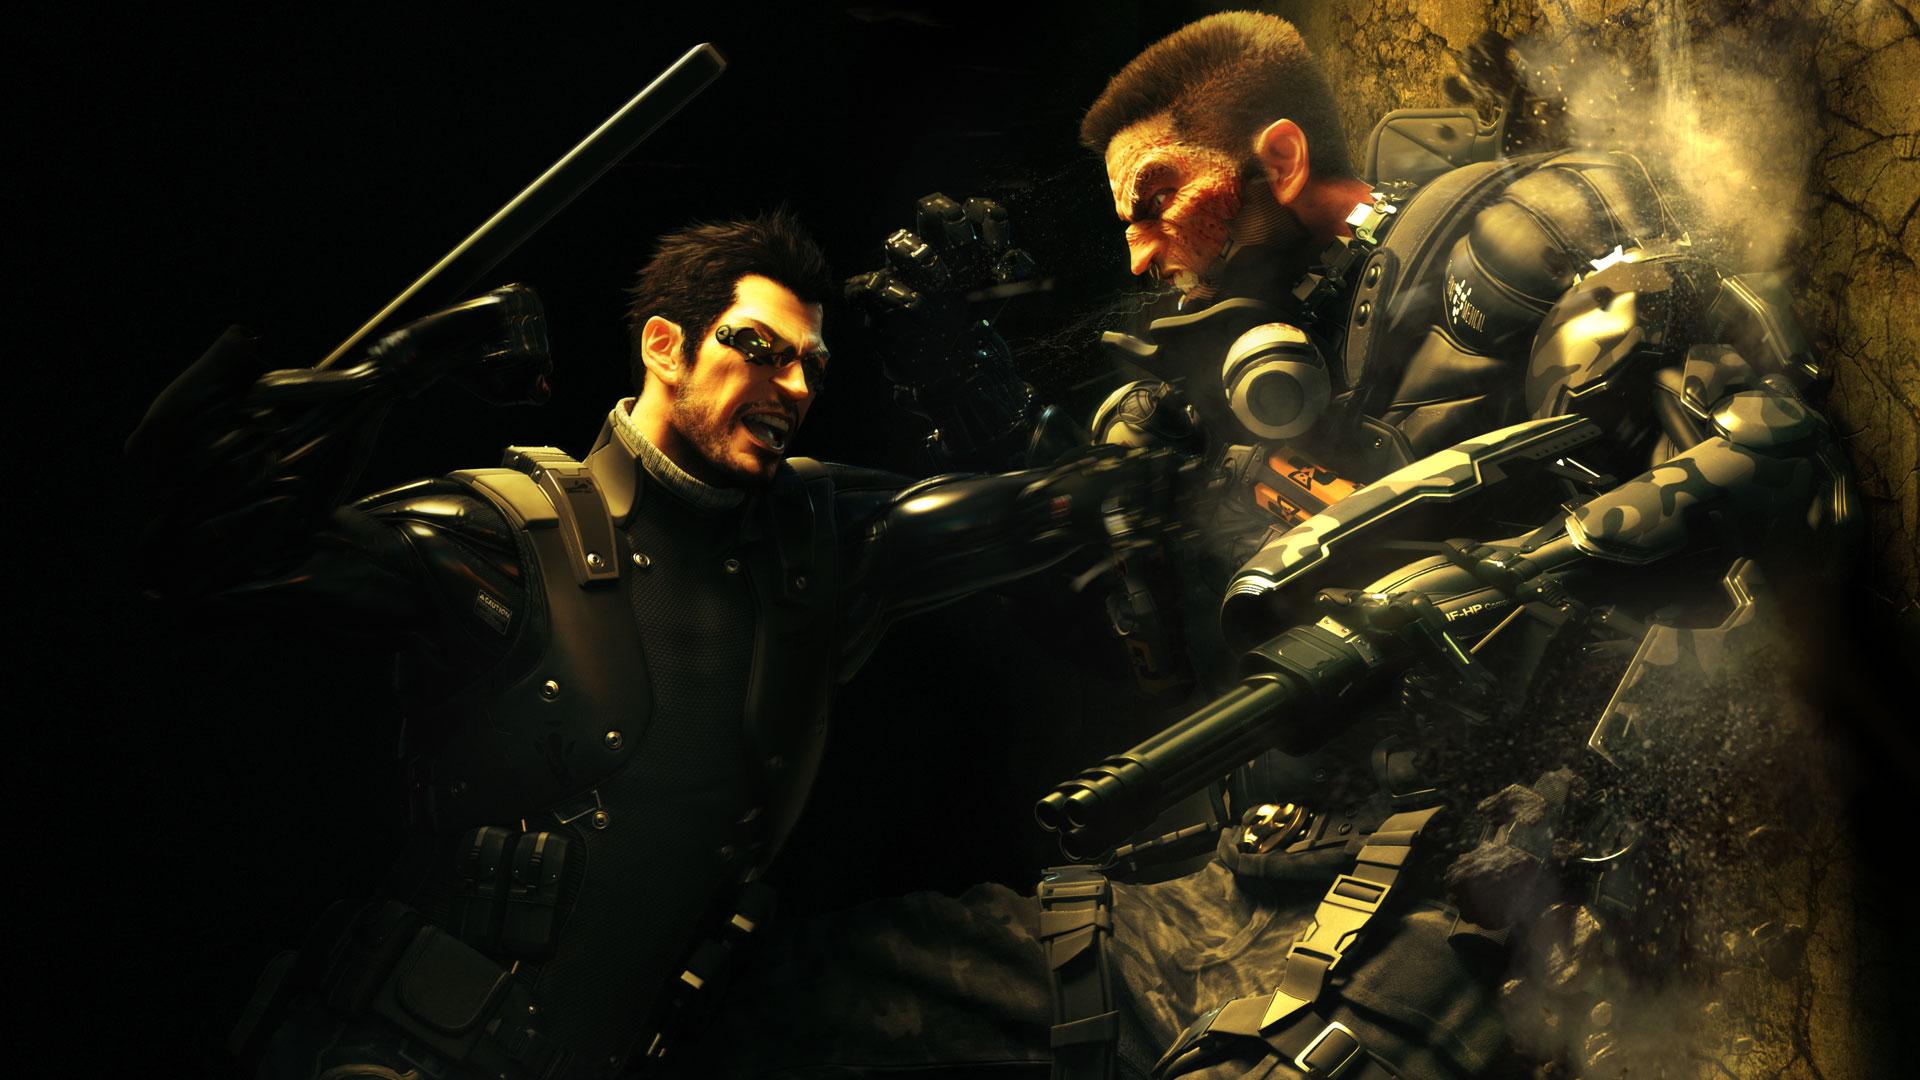 7eb158096be0173018bc837c5b58282eed6fb54c.jpg - Deus Ex: Human Revolution